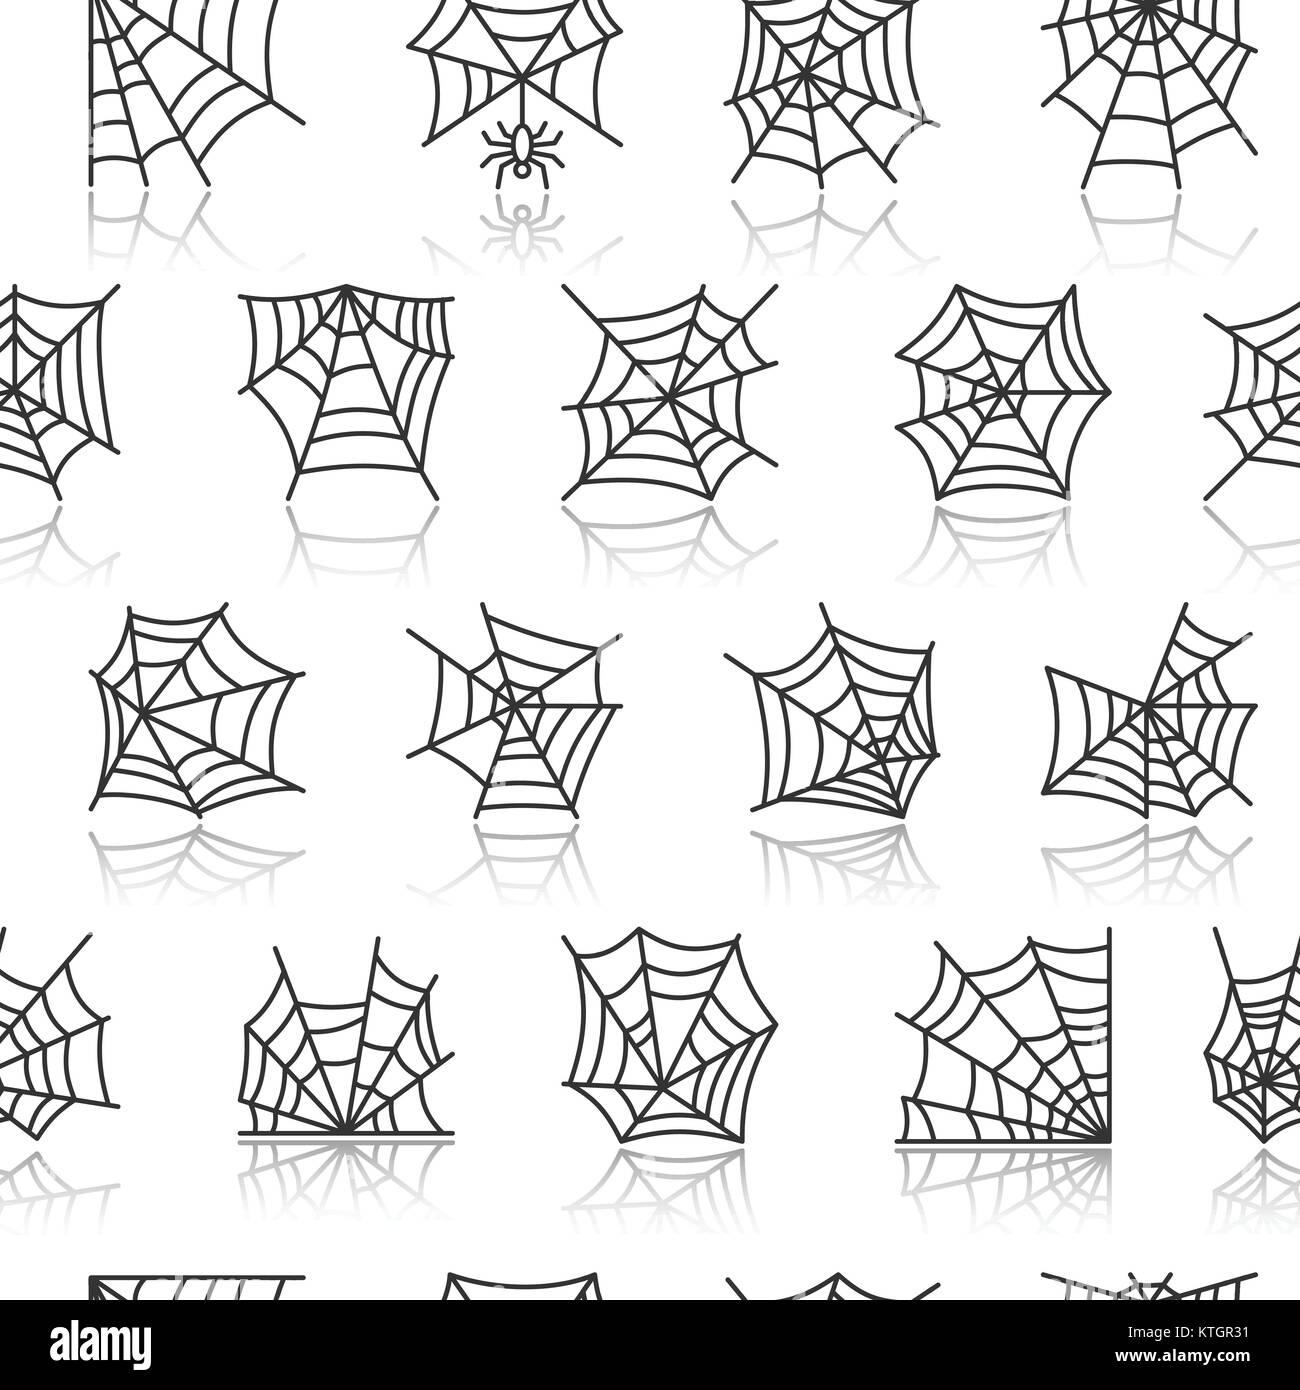 Wrapping Web Imágenes De Stock & Wrapping Web Fotos De Stock - Alamy